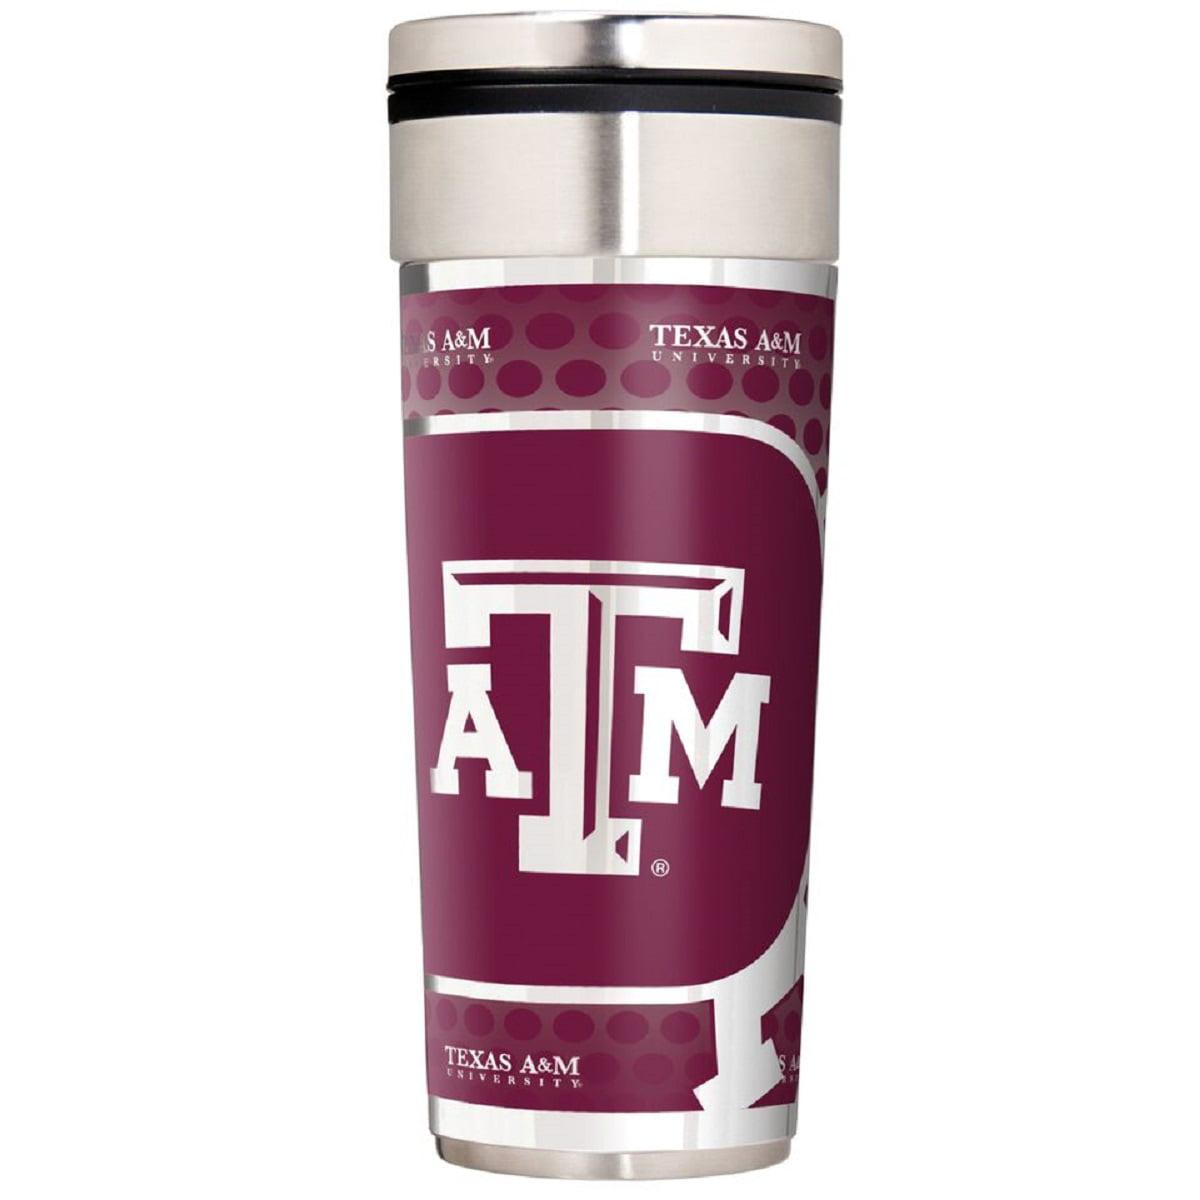 Texas A&M Aggies 22 oz. Stainless Steel Big Slim Travel Tumbler